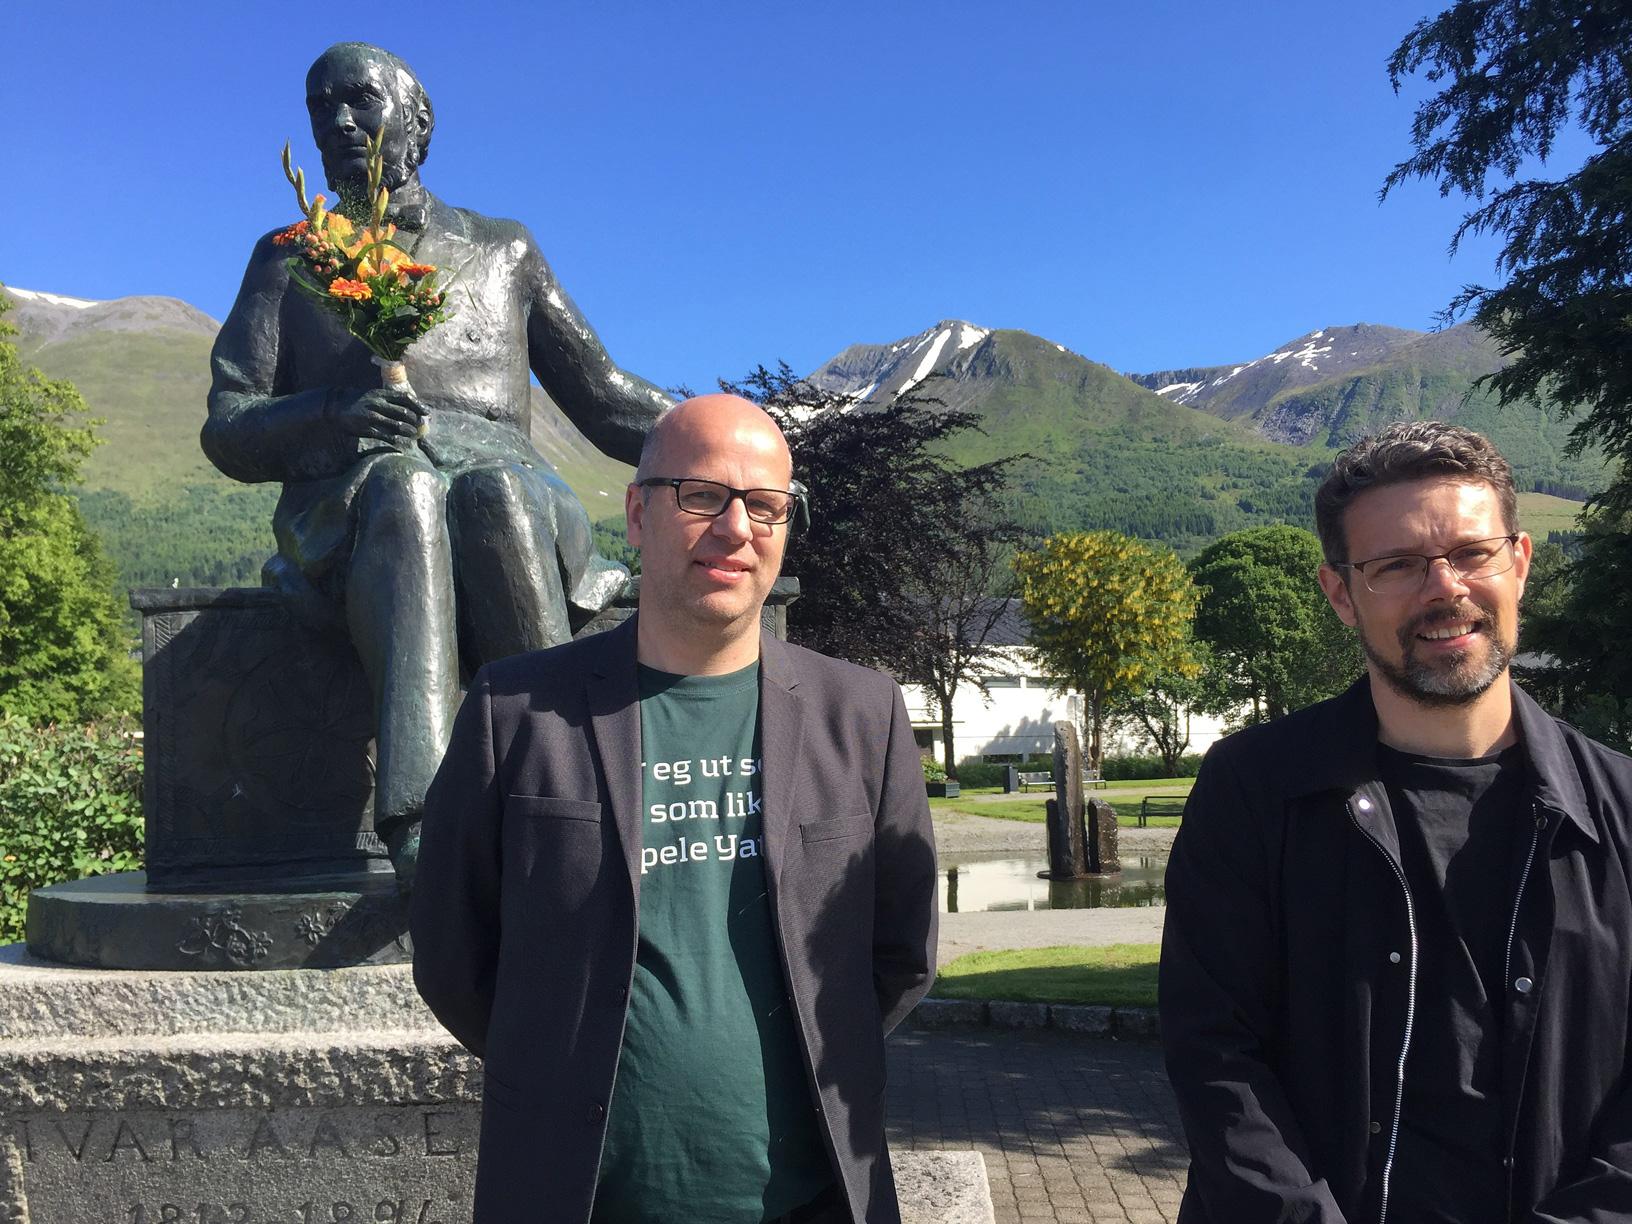 Dagleg leiar i Aasentunet Gaute Øvereng saman med festspeldiktar Lars Mæhle. Foto: Karoline Riise Kristiansen/NPK